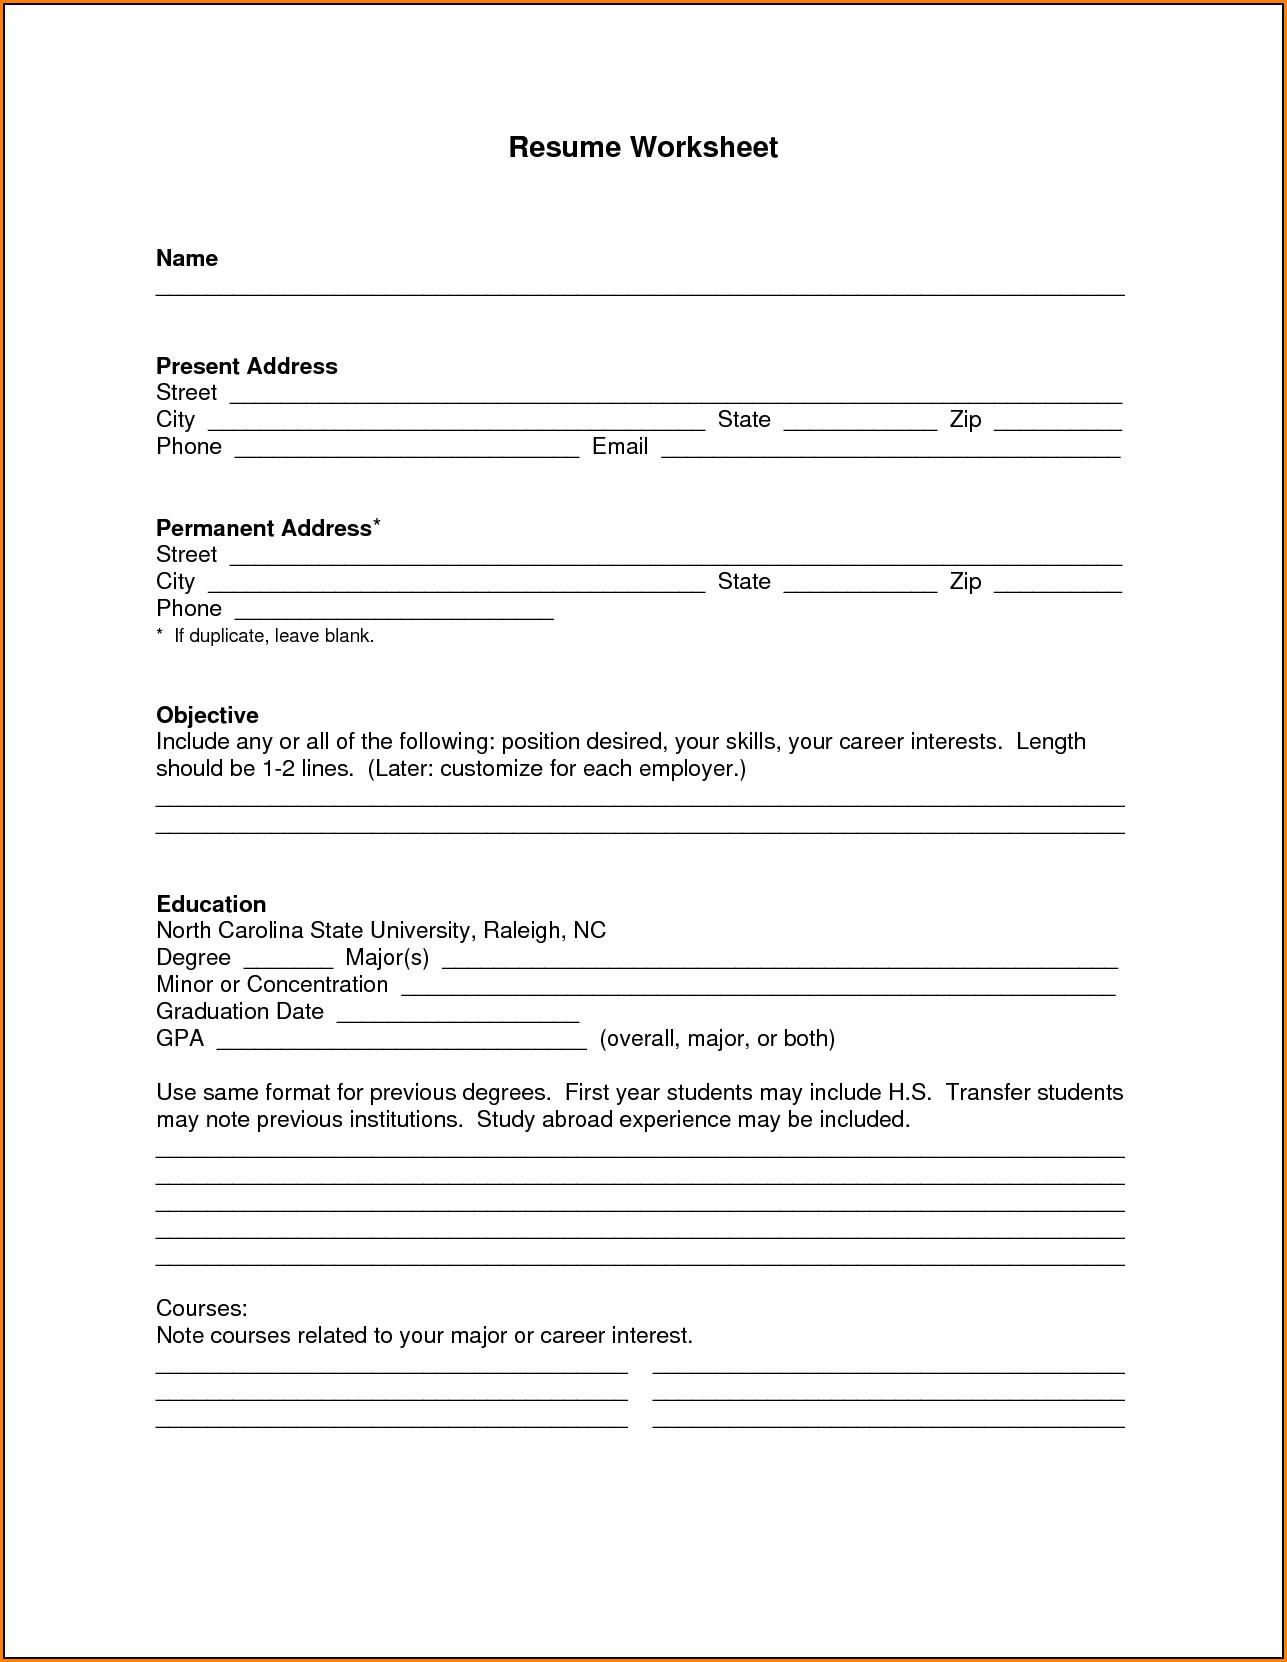 Blank Resume Form